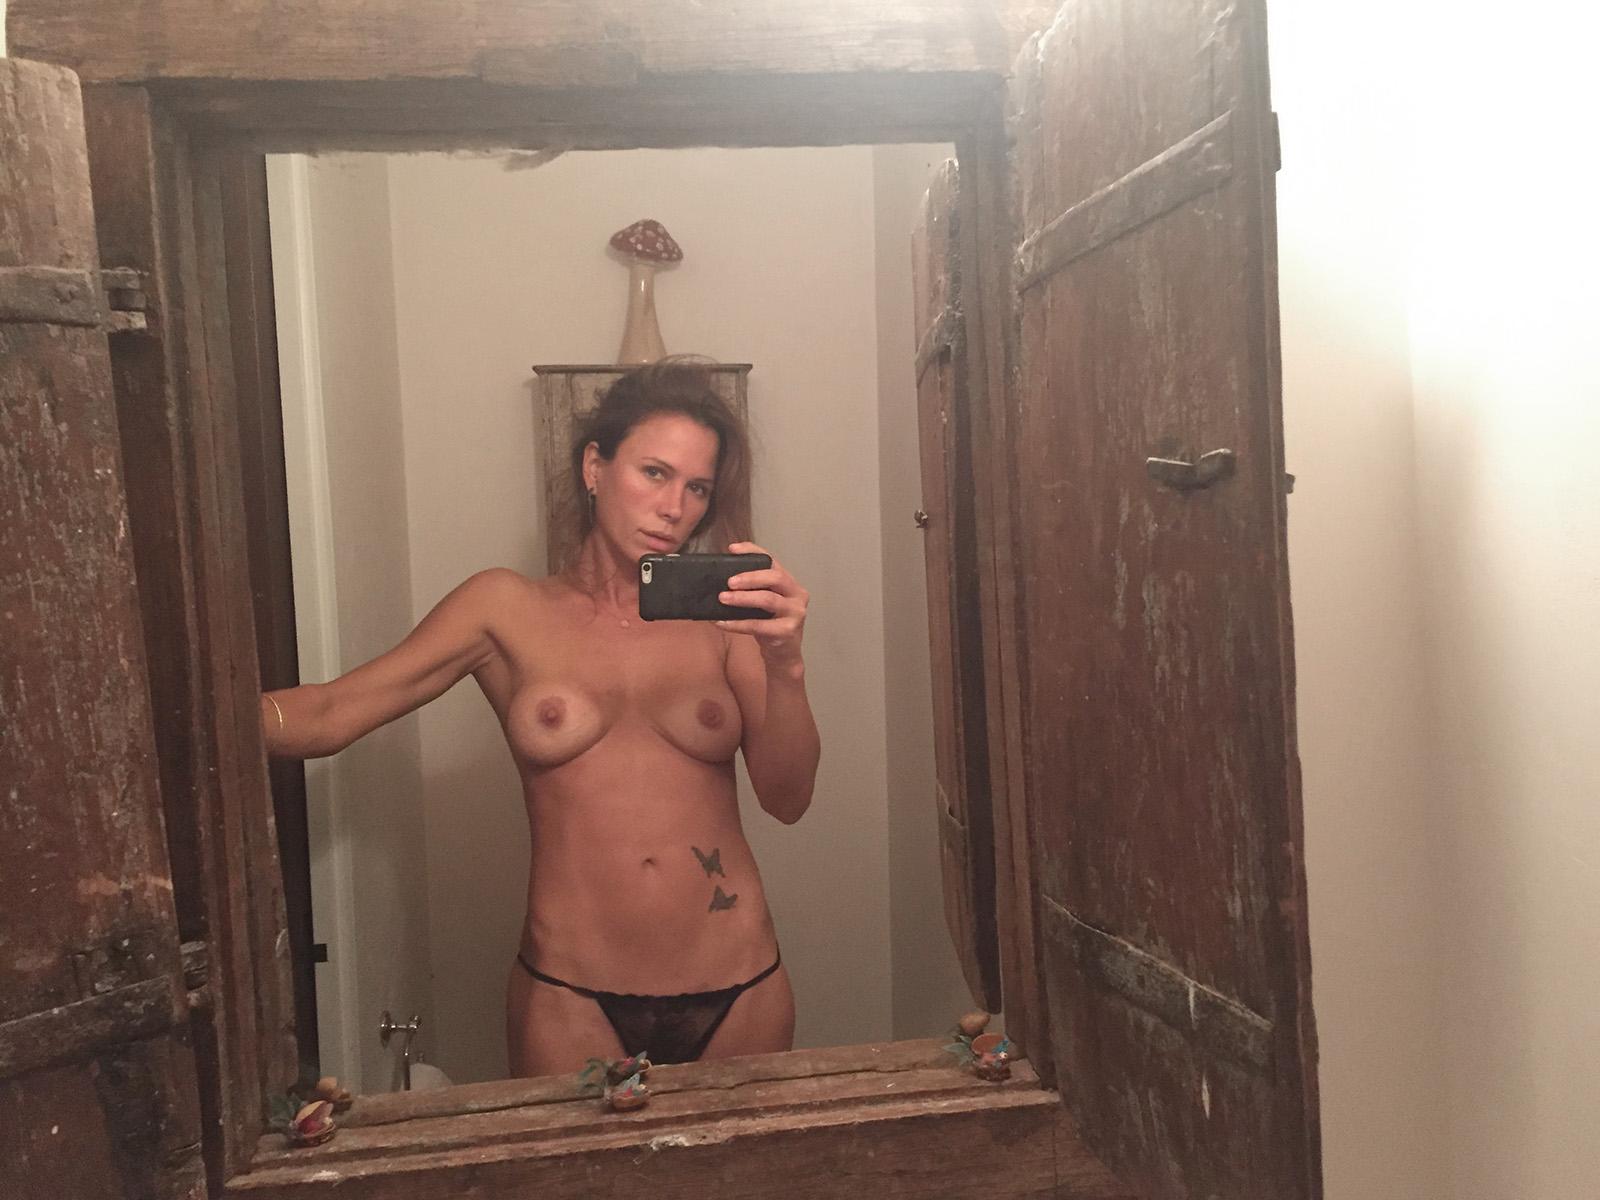 Rhona Mitra leaked nude masturbation photos The Fappening 2019